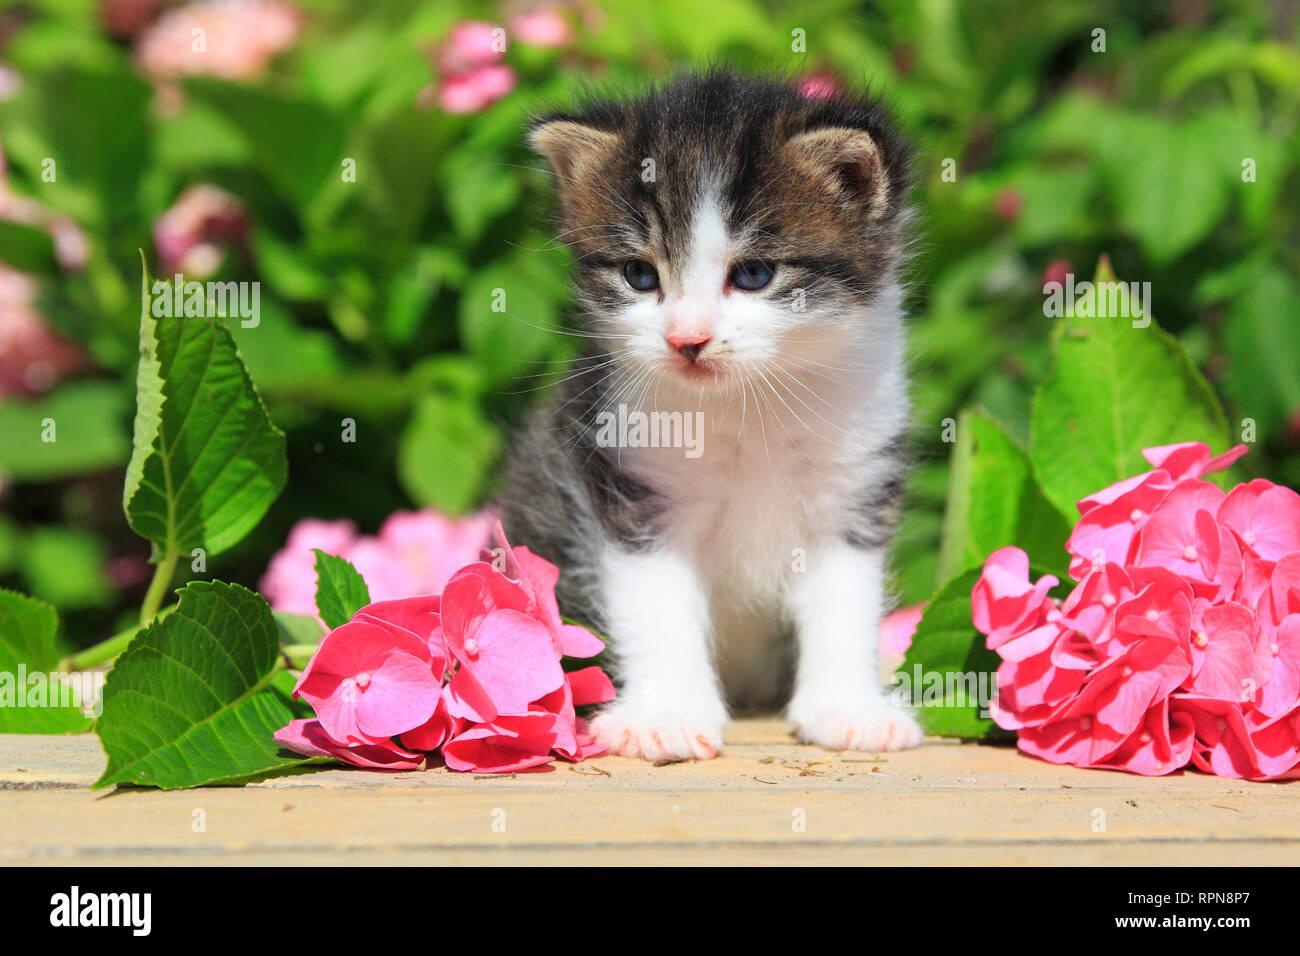 Zoología / animales, mamíferos (Mammalia), gatito, animales domésticos, Suiza, Additional-Rights-Clearance-Info-Not-Available Imagen De Stock